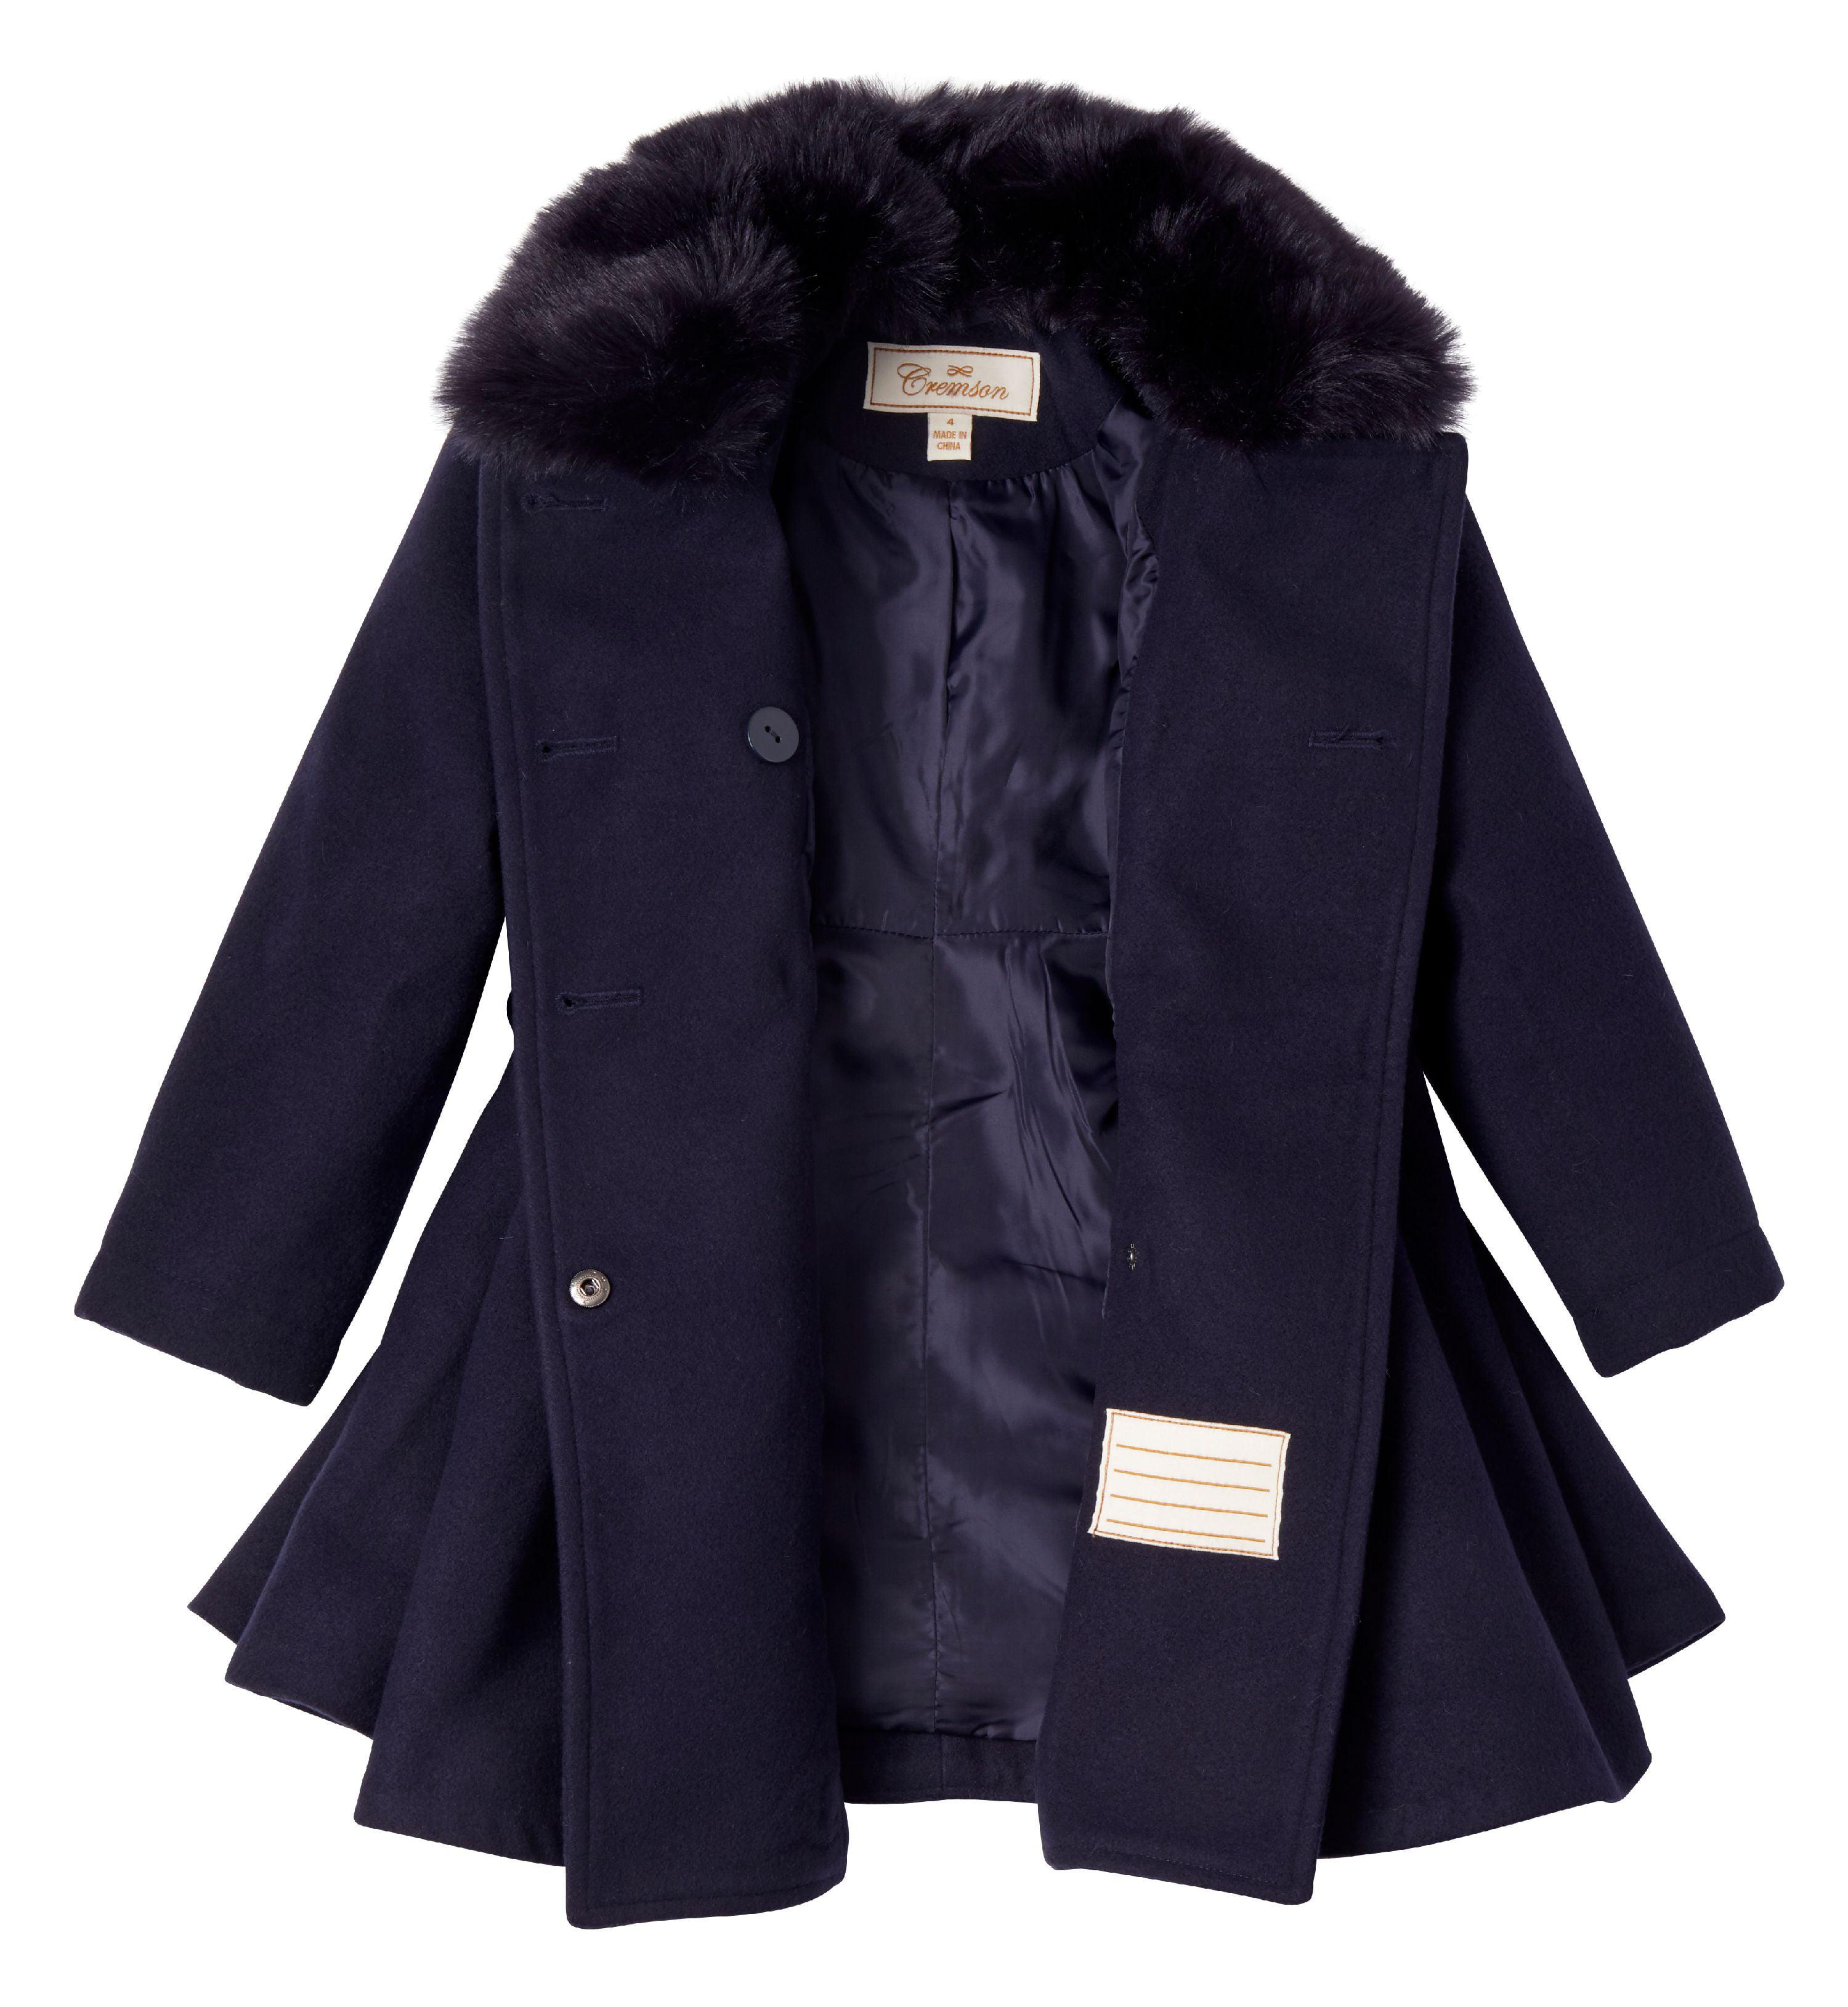 Cremson Girl Wool Look Winter Princess Bow Dress Pea Coat Jacket Faux Fur Collar